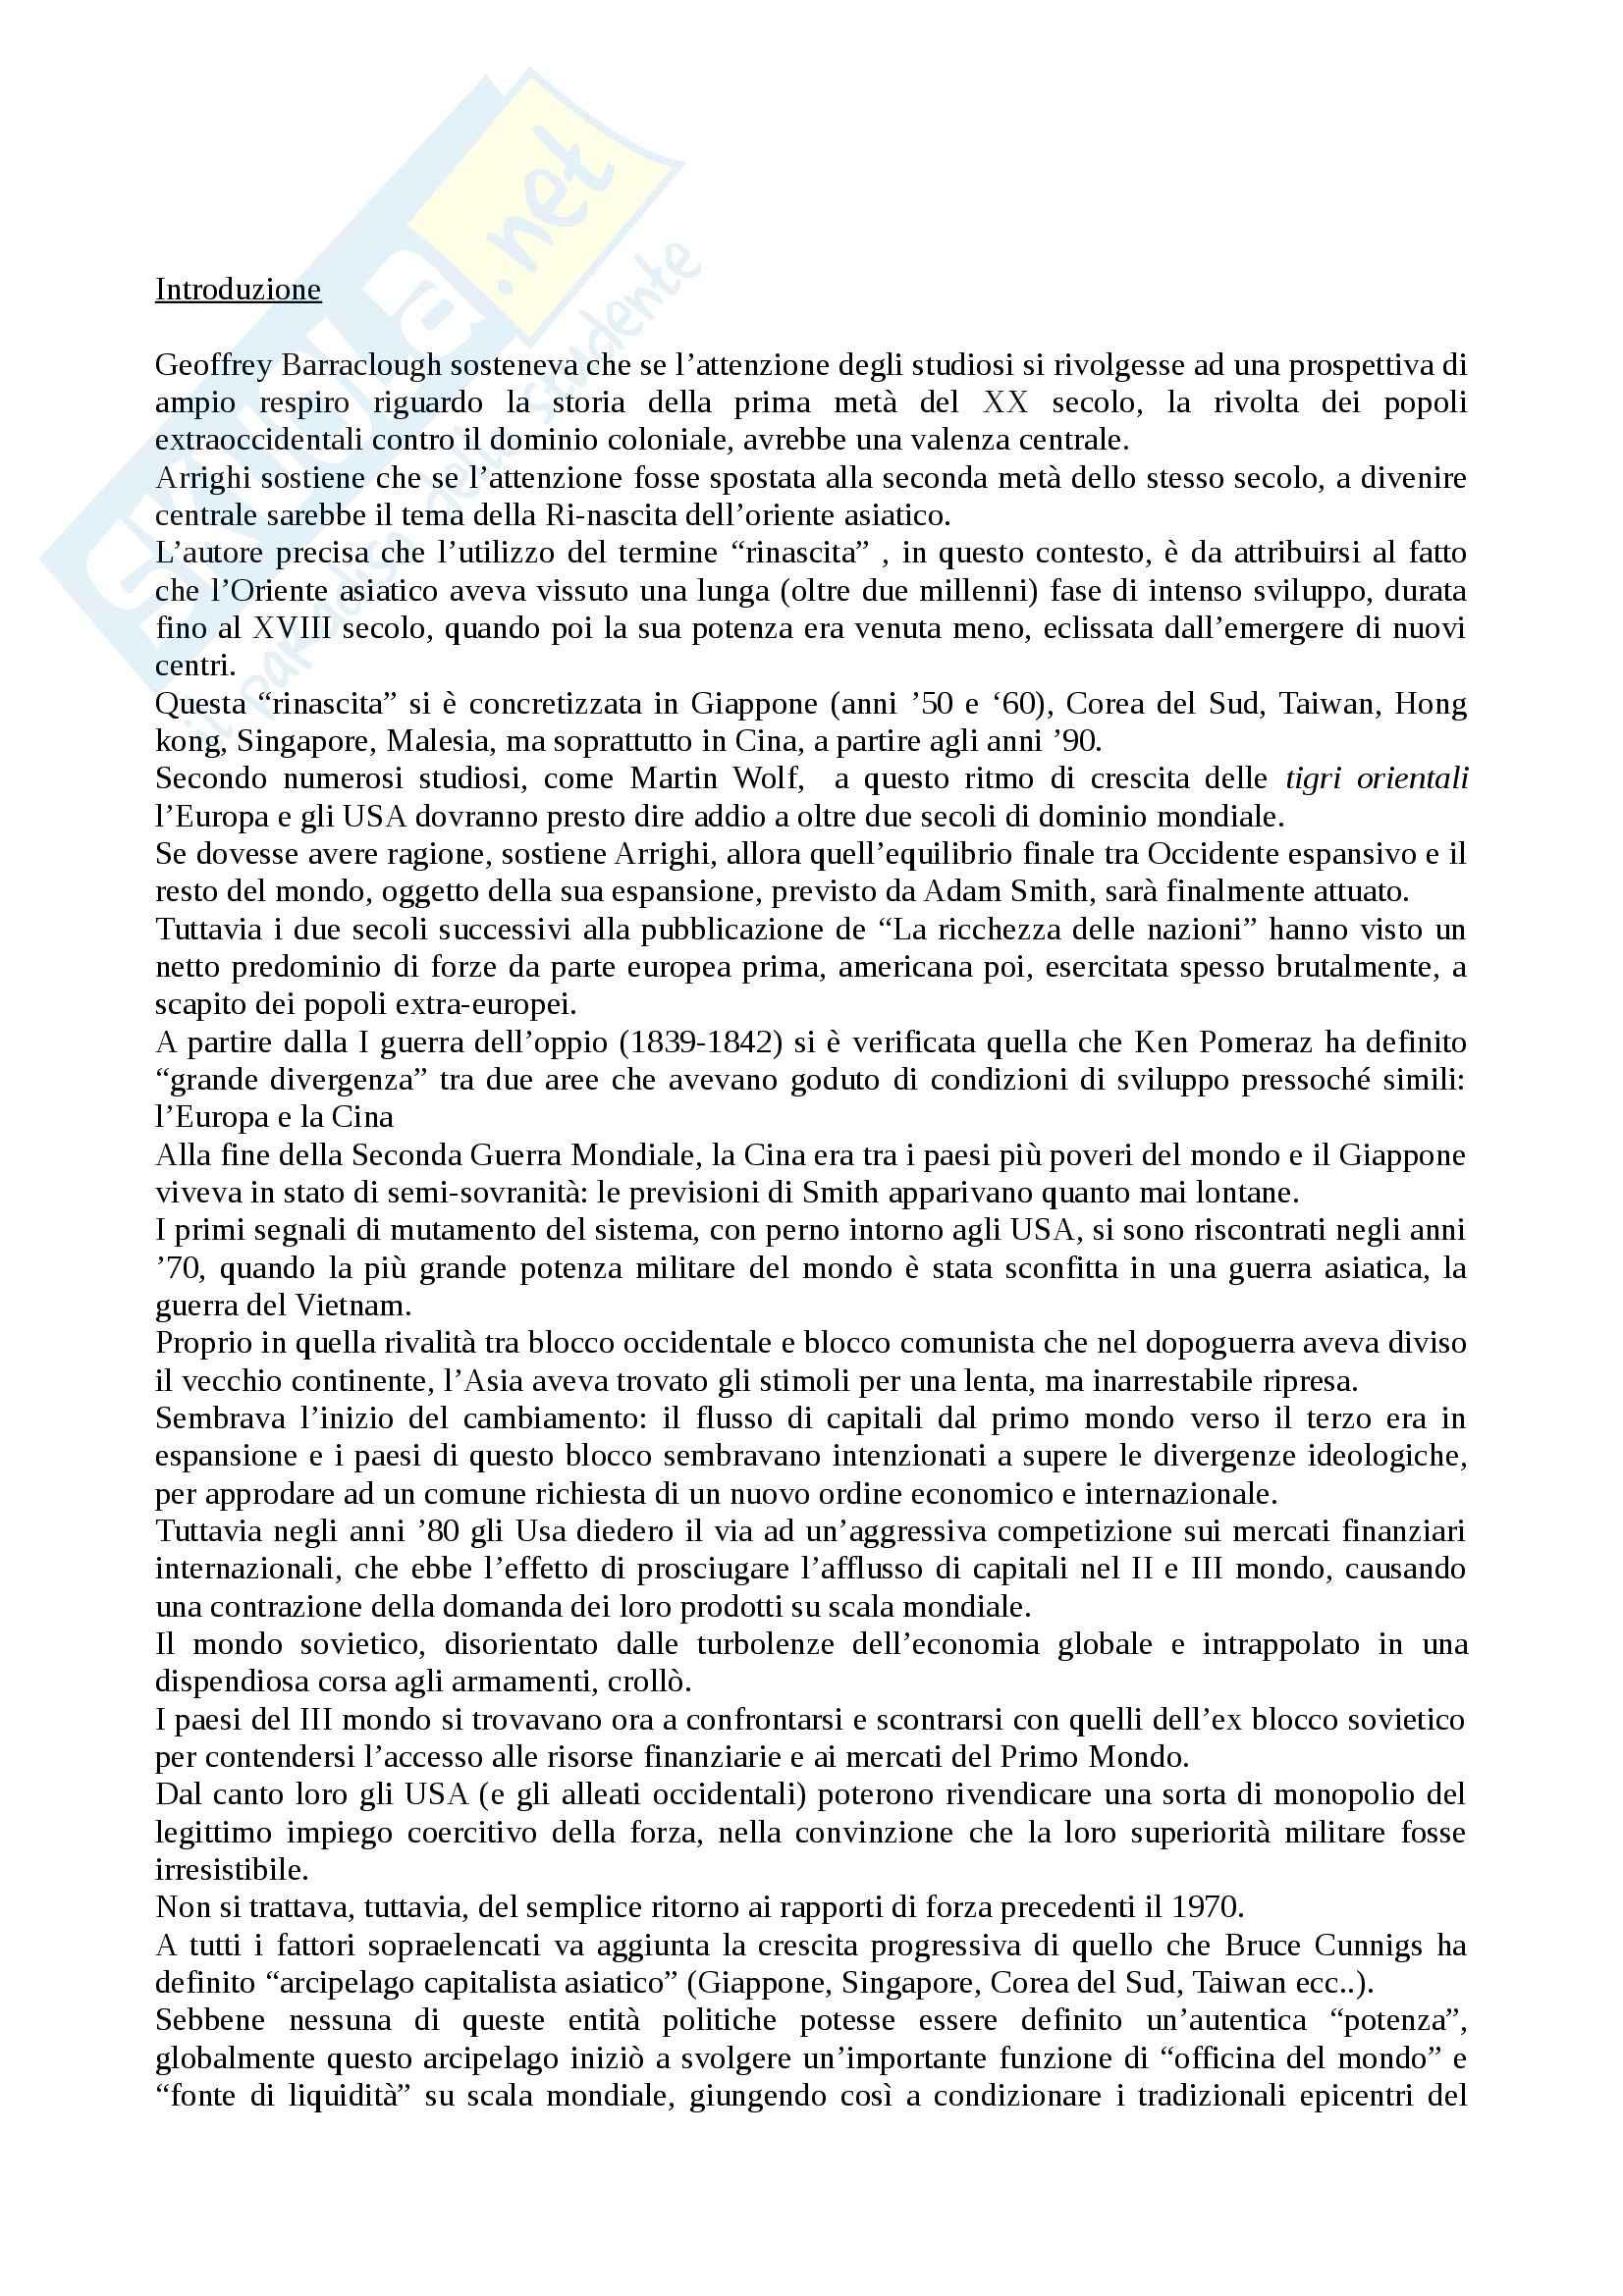 Riassunto esame Storia Contemporanea, prof. Mantelli, libro consigliato Adam Smith a Pechino, Arrighi